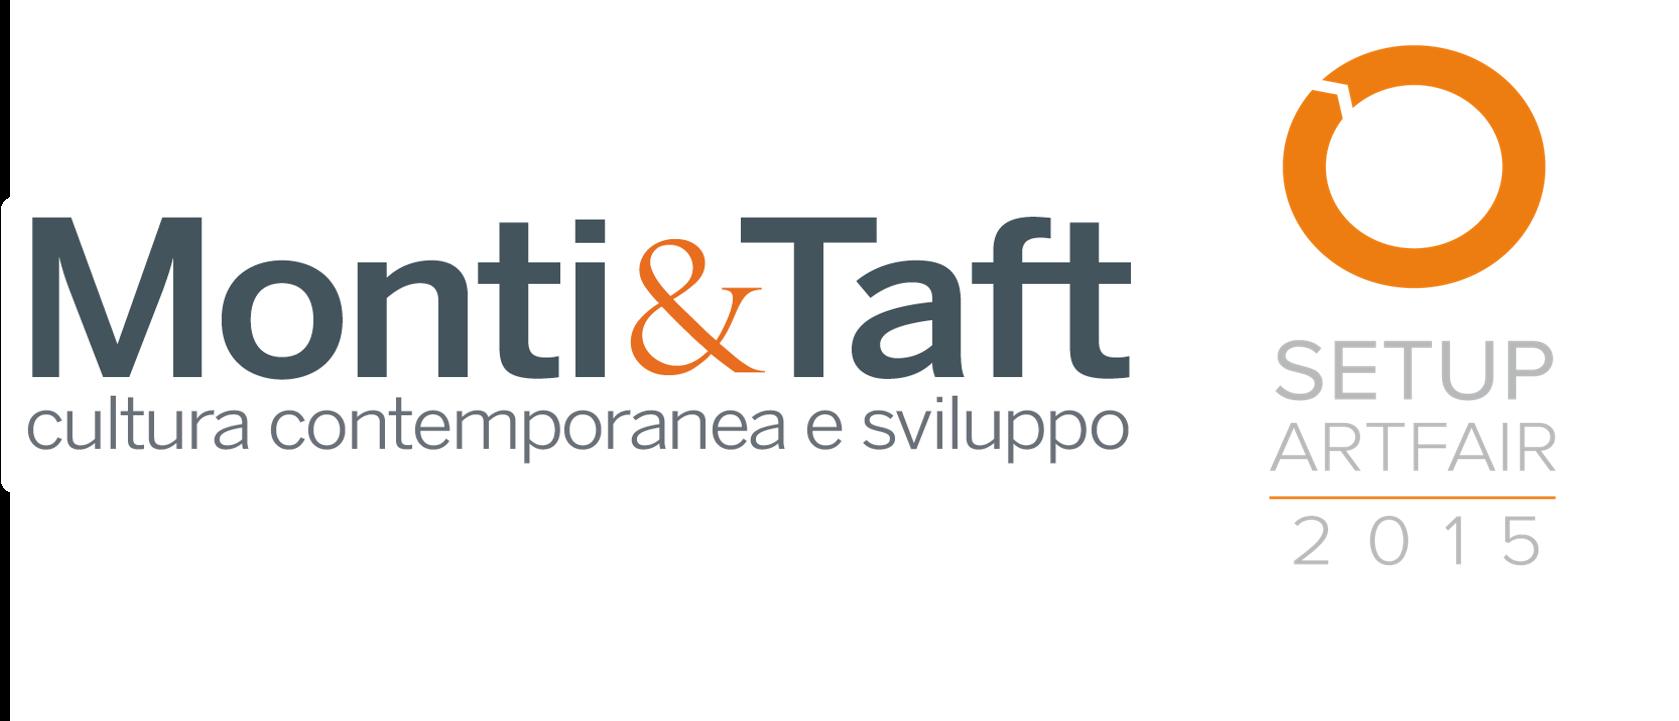 Monti&Taft SetUp ArtFair 2015 Bologna